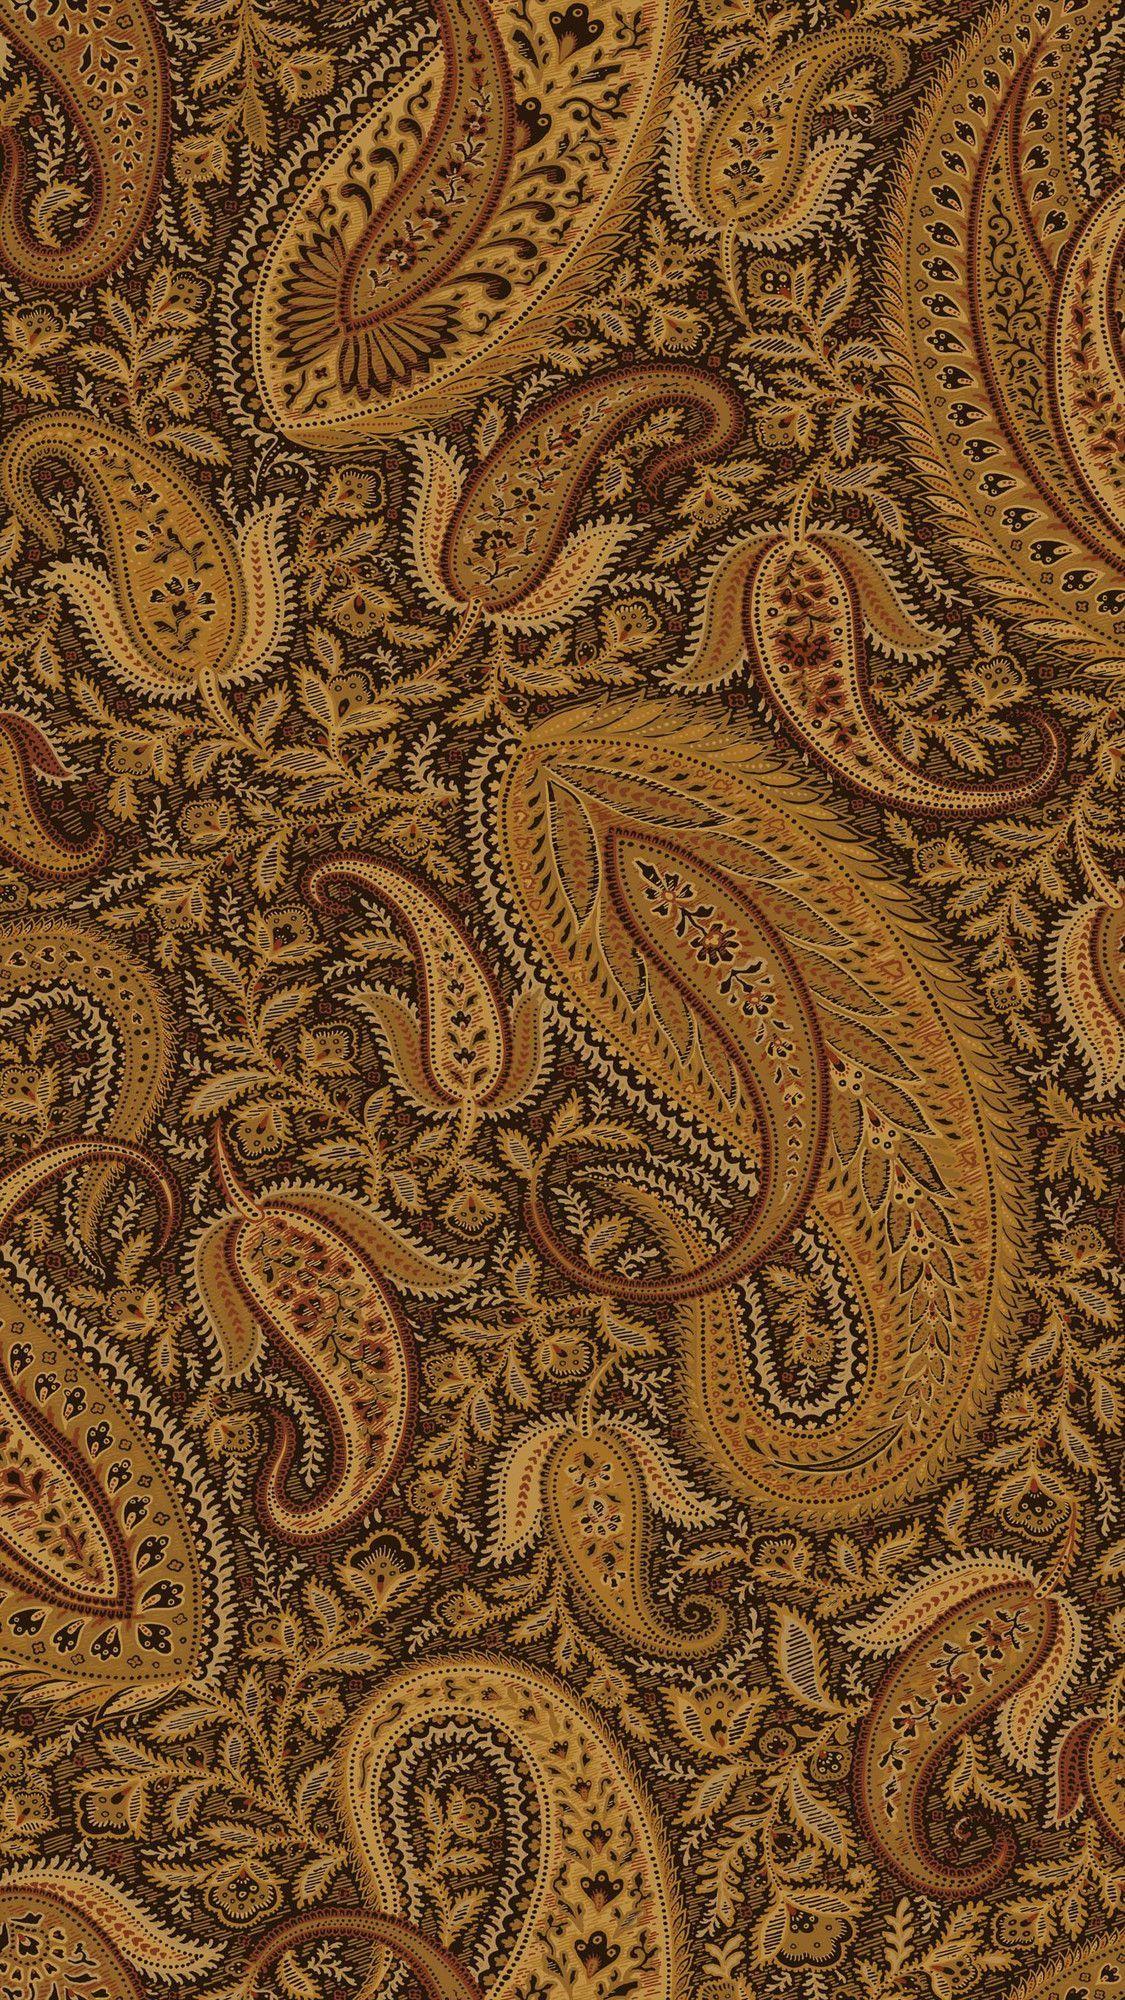 gentlemen 39 s quarters nathaniel modern 27 39 x 27 paisley wallpaper paisley pattern pinterest. Black Bedroom Furniture Sets. Home Design Ideas